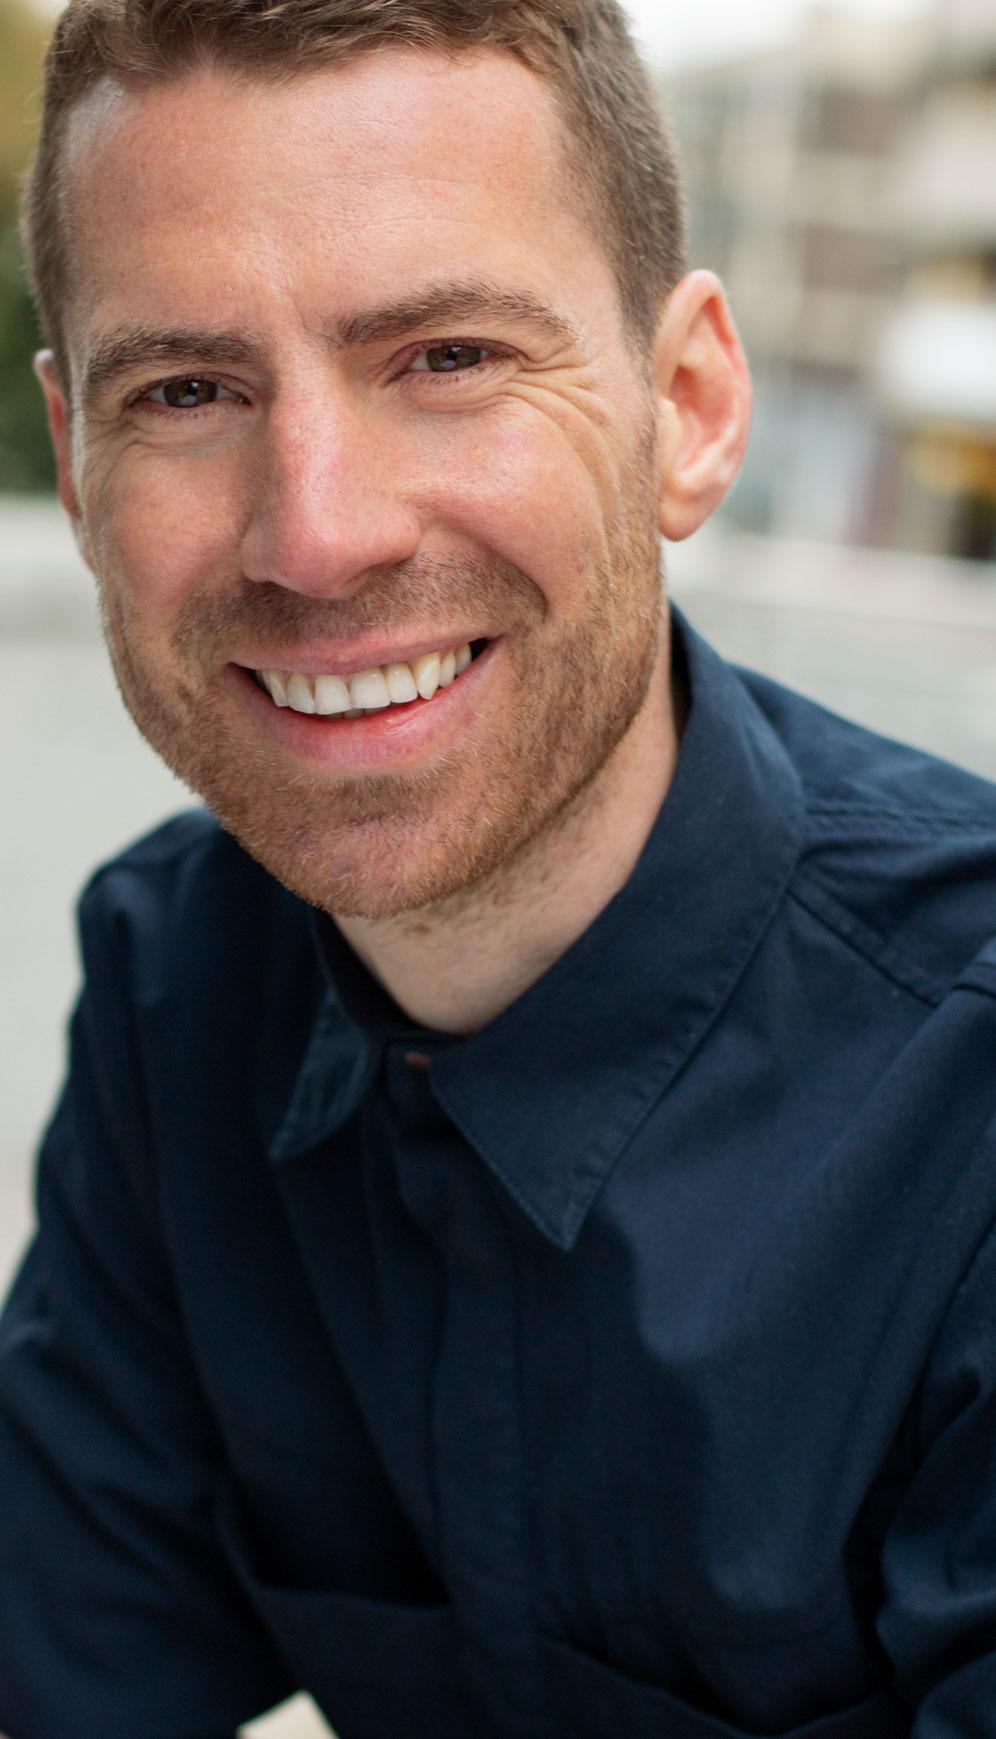 Portrait of a white man smiling. Outdoor portrait photoshoot in Birmingham U.K.